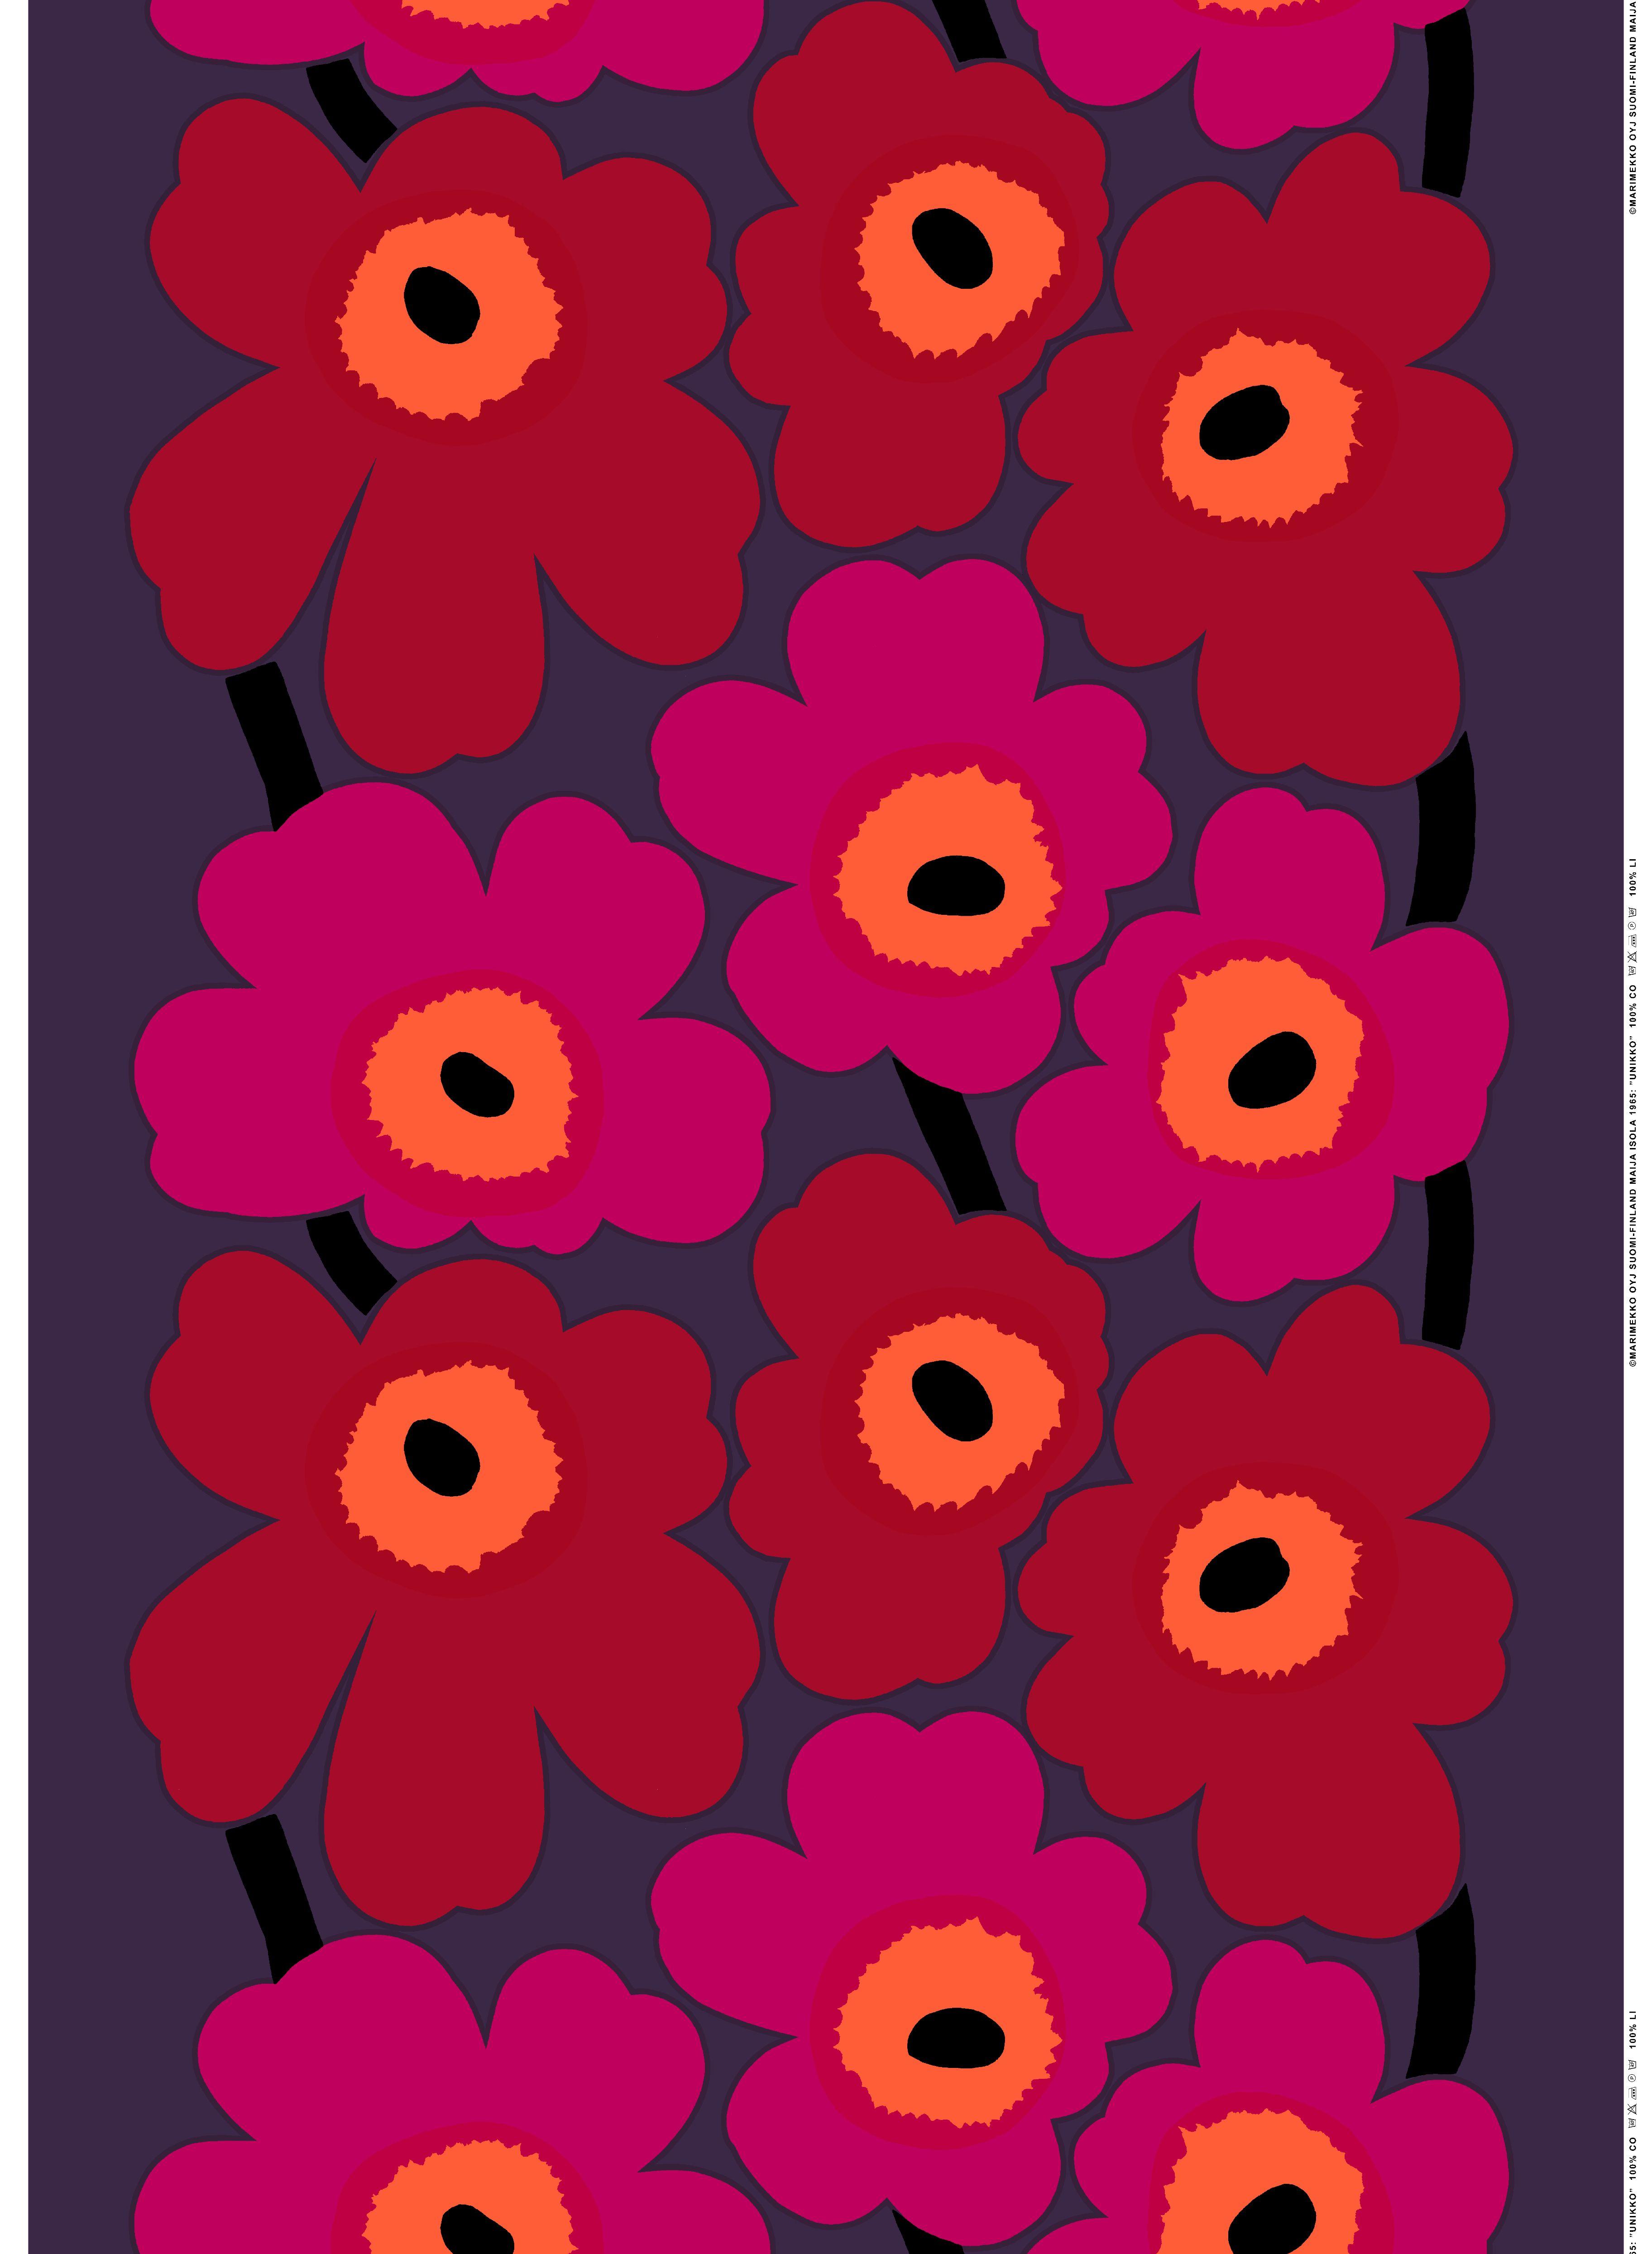 unikko tissus marimekko marimekko pinterest bricolage d co affiche vintage et berb res. Black Bedroom Furniture Sets. Home Design Ideas